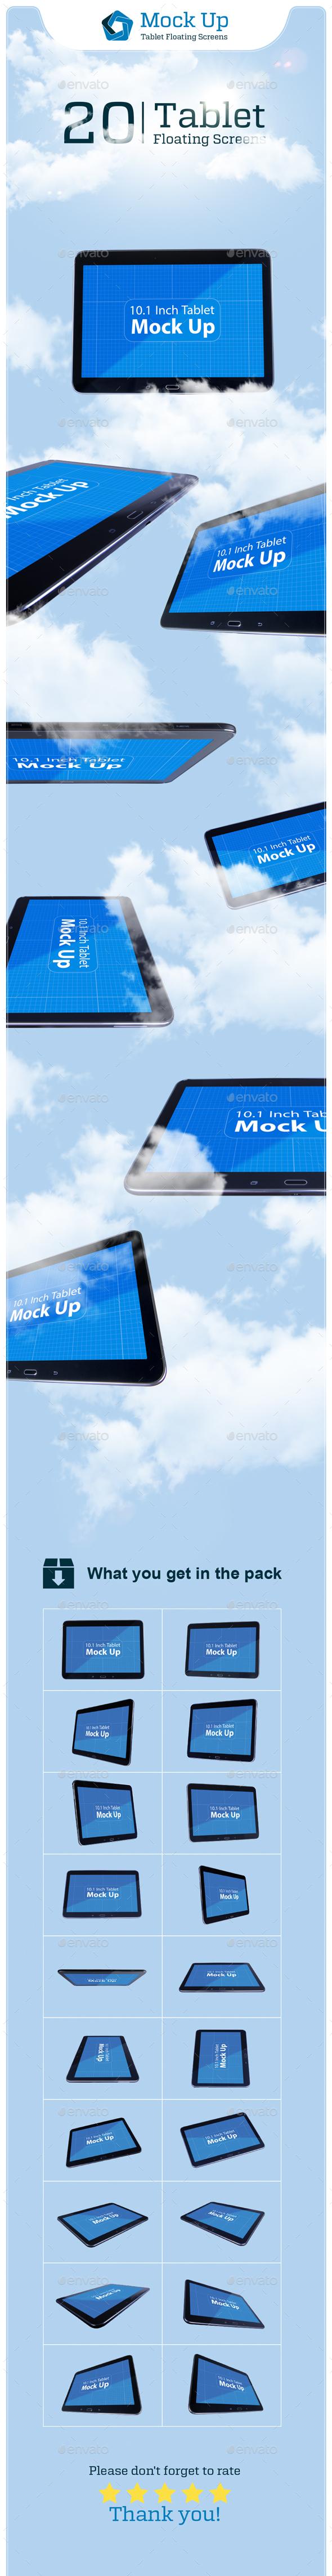 Tablet Floating Screens - Mobile Displays